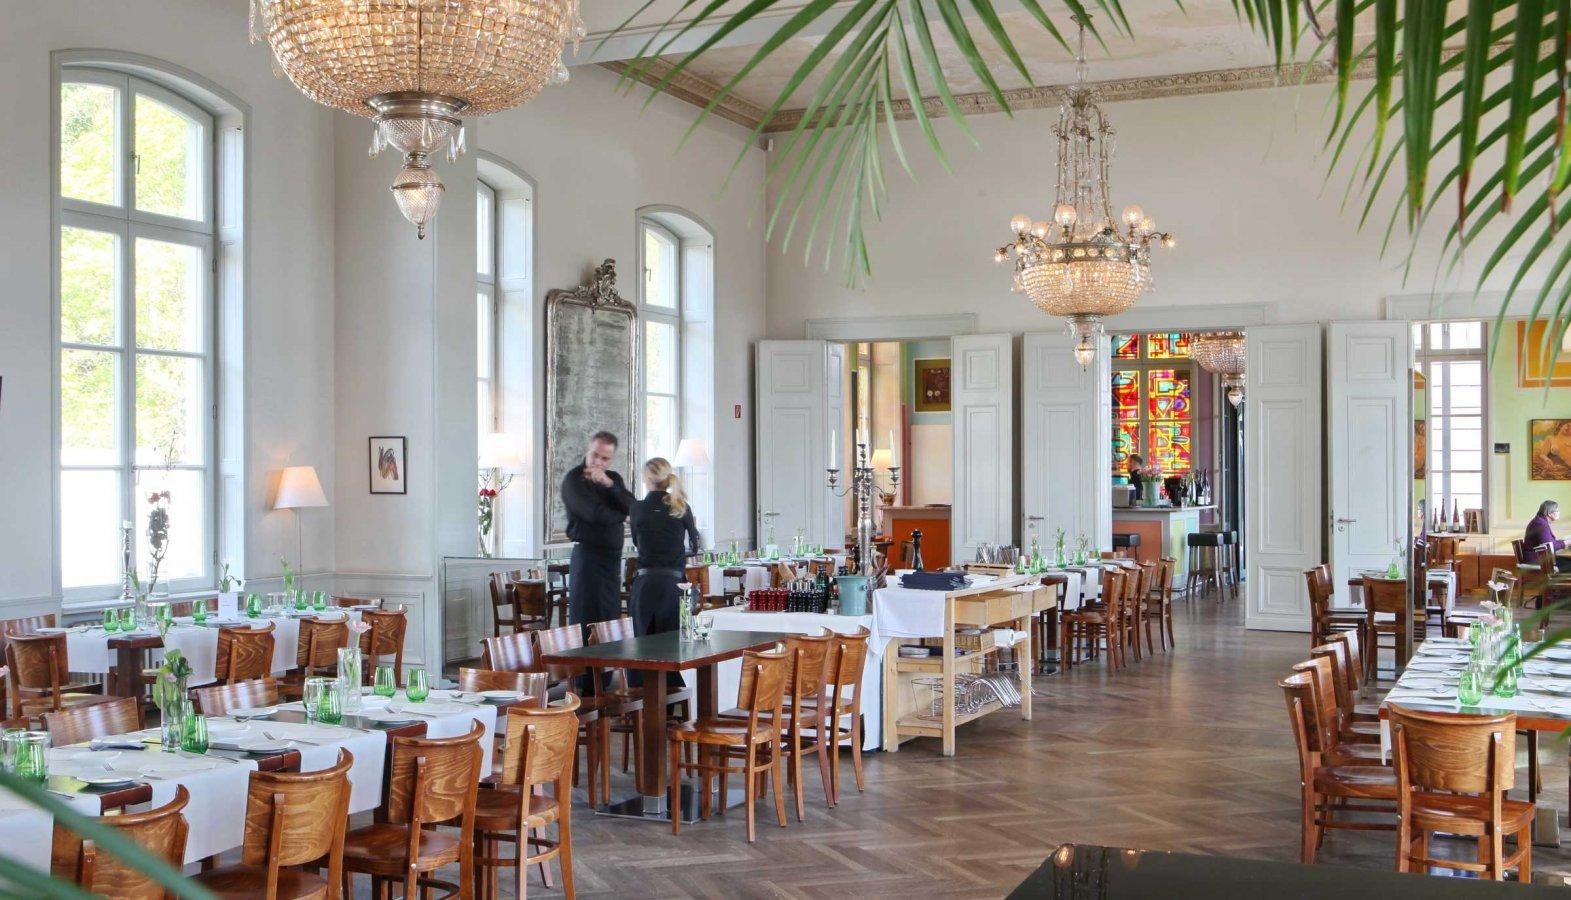 Feiern tagen arp museum bahnhof rolandseck for Interieur no 253